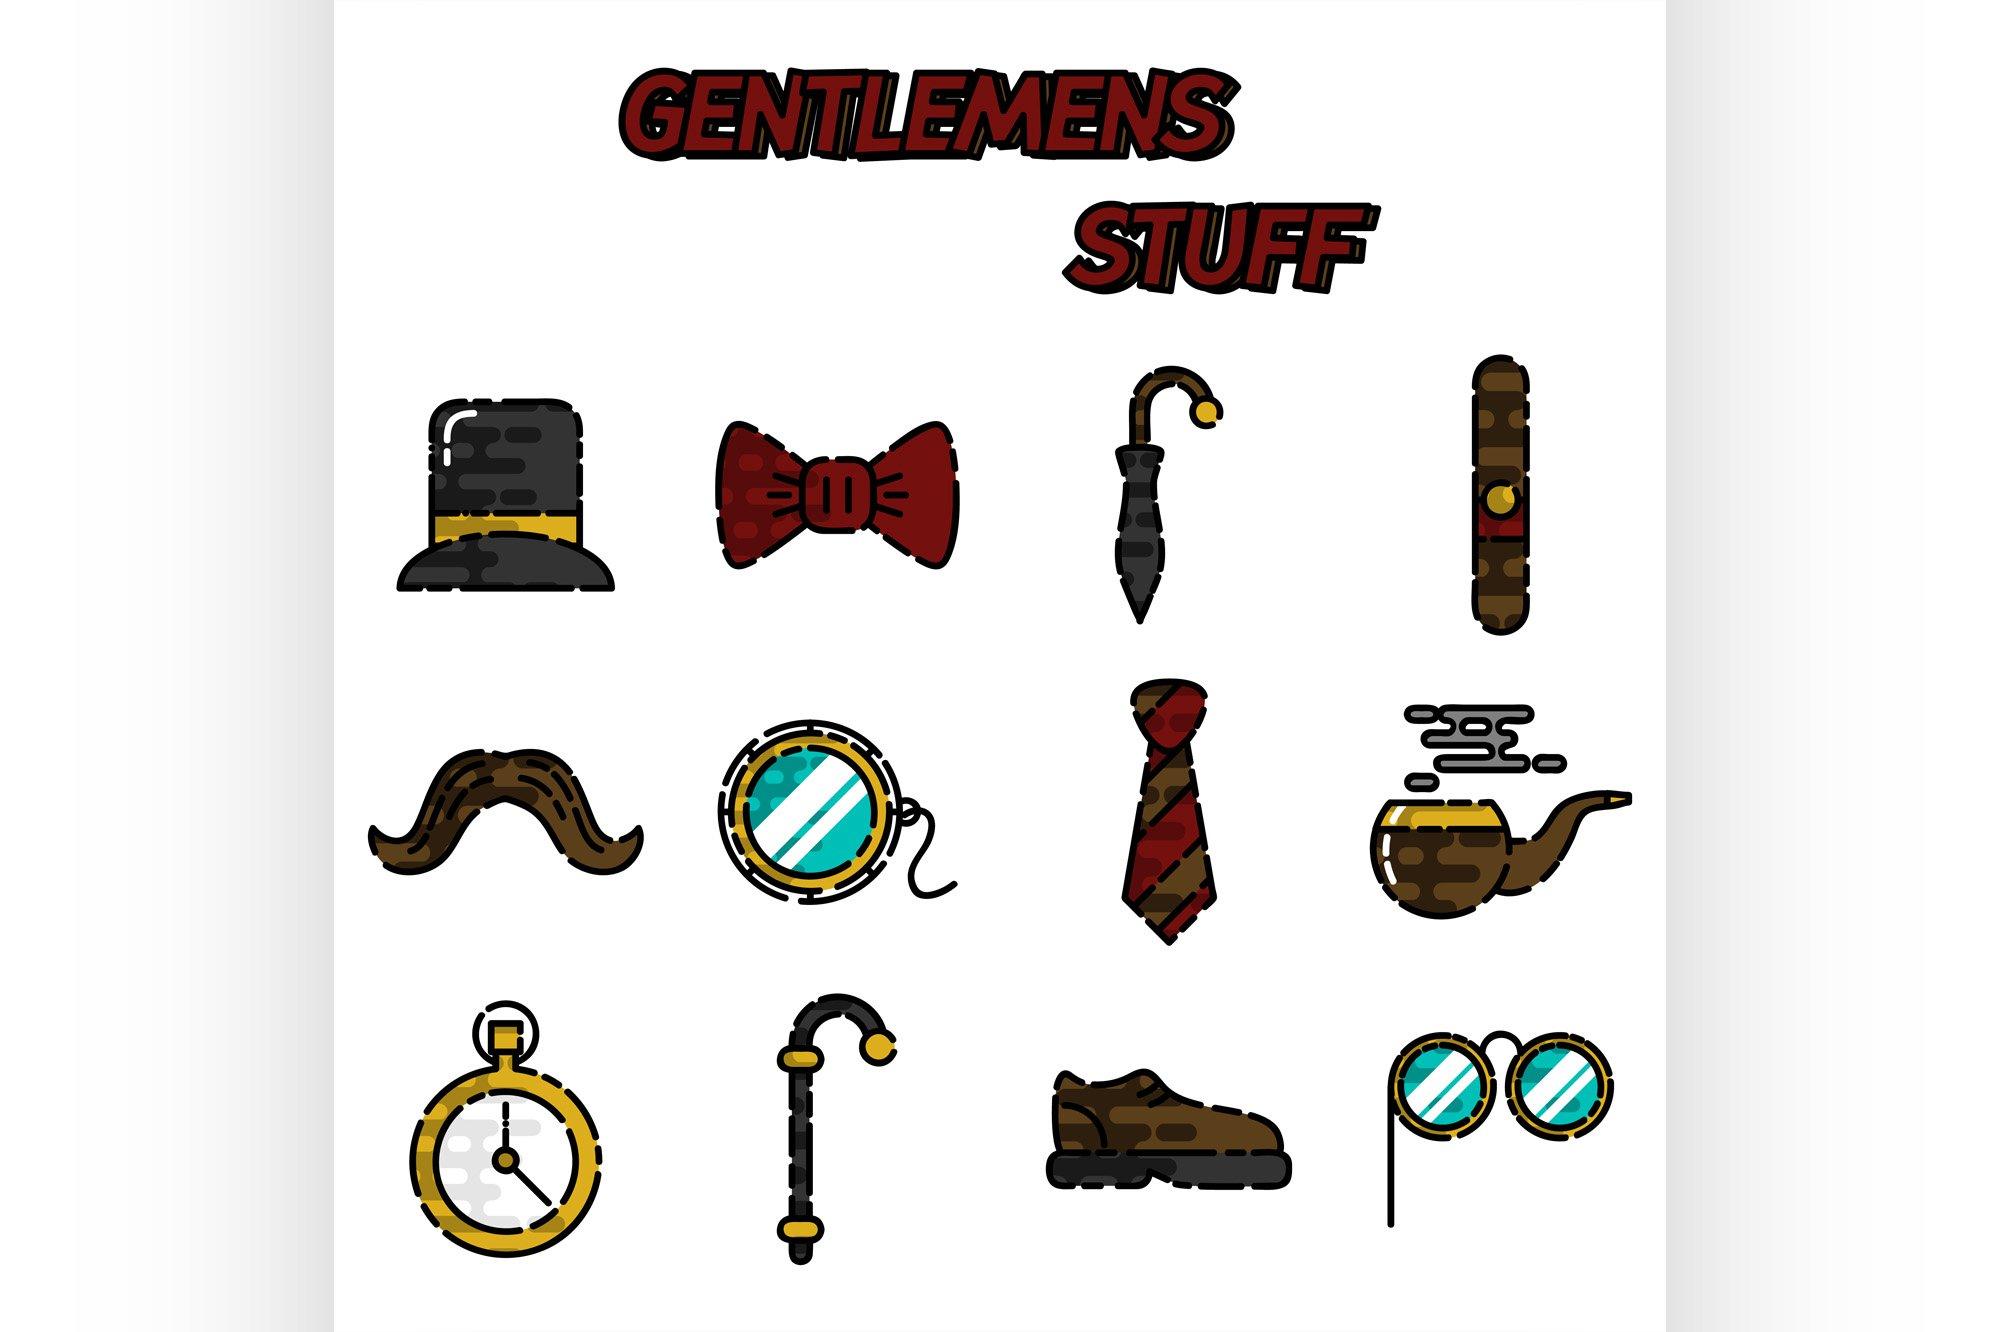 Gentlemens vintage stuff flat icon set example image 1